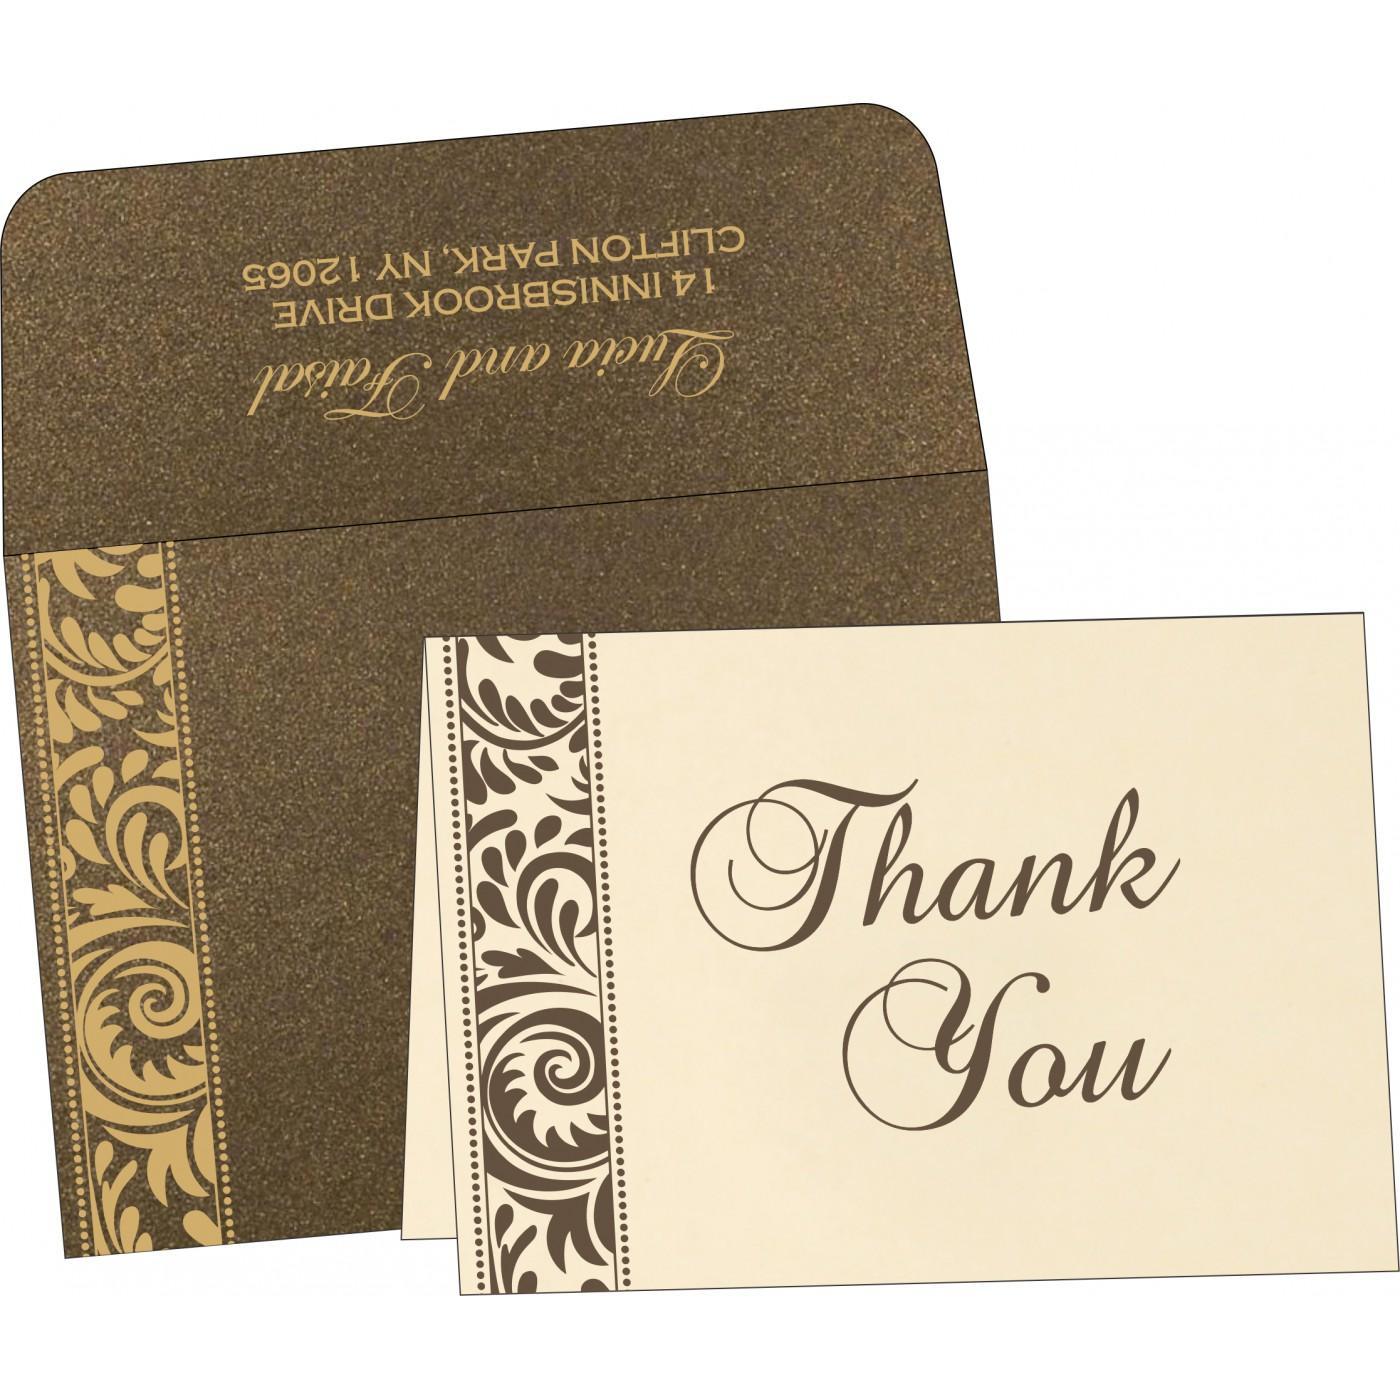 Thank You Cards : TYC-8235K - 123WeddingCards